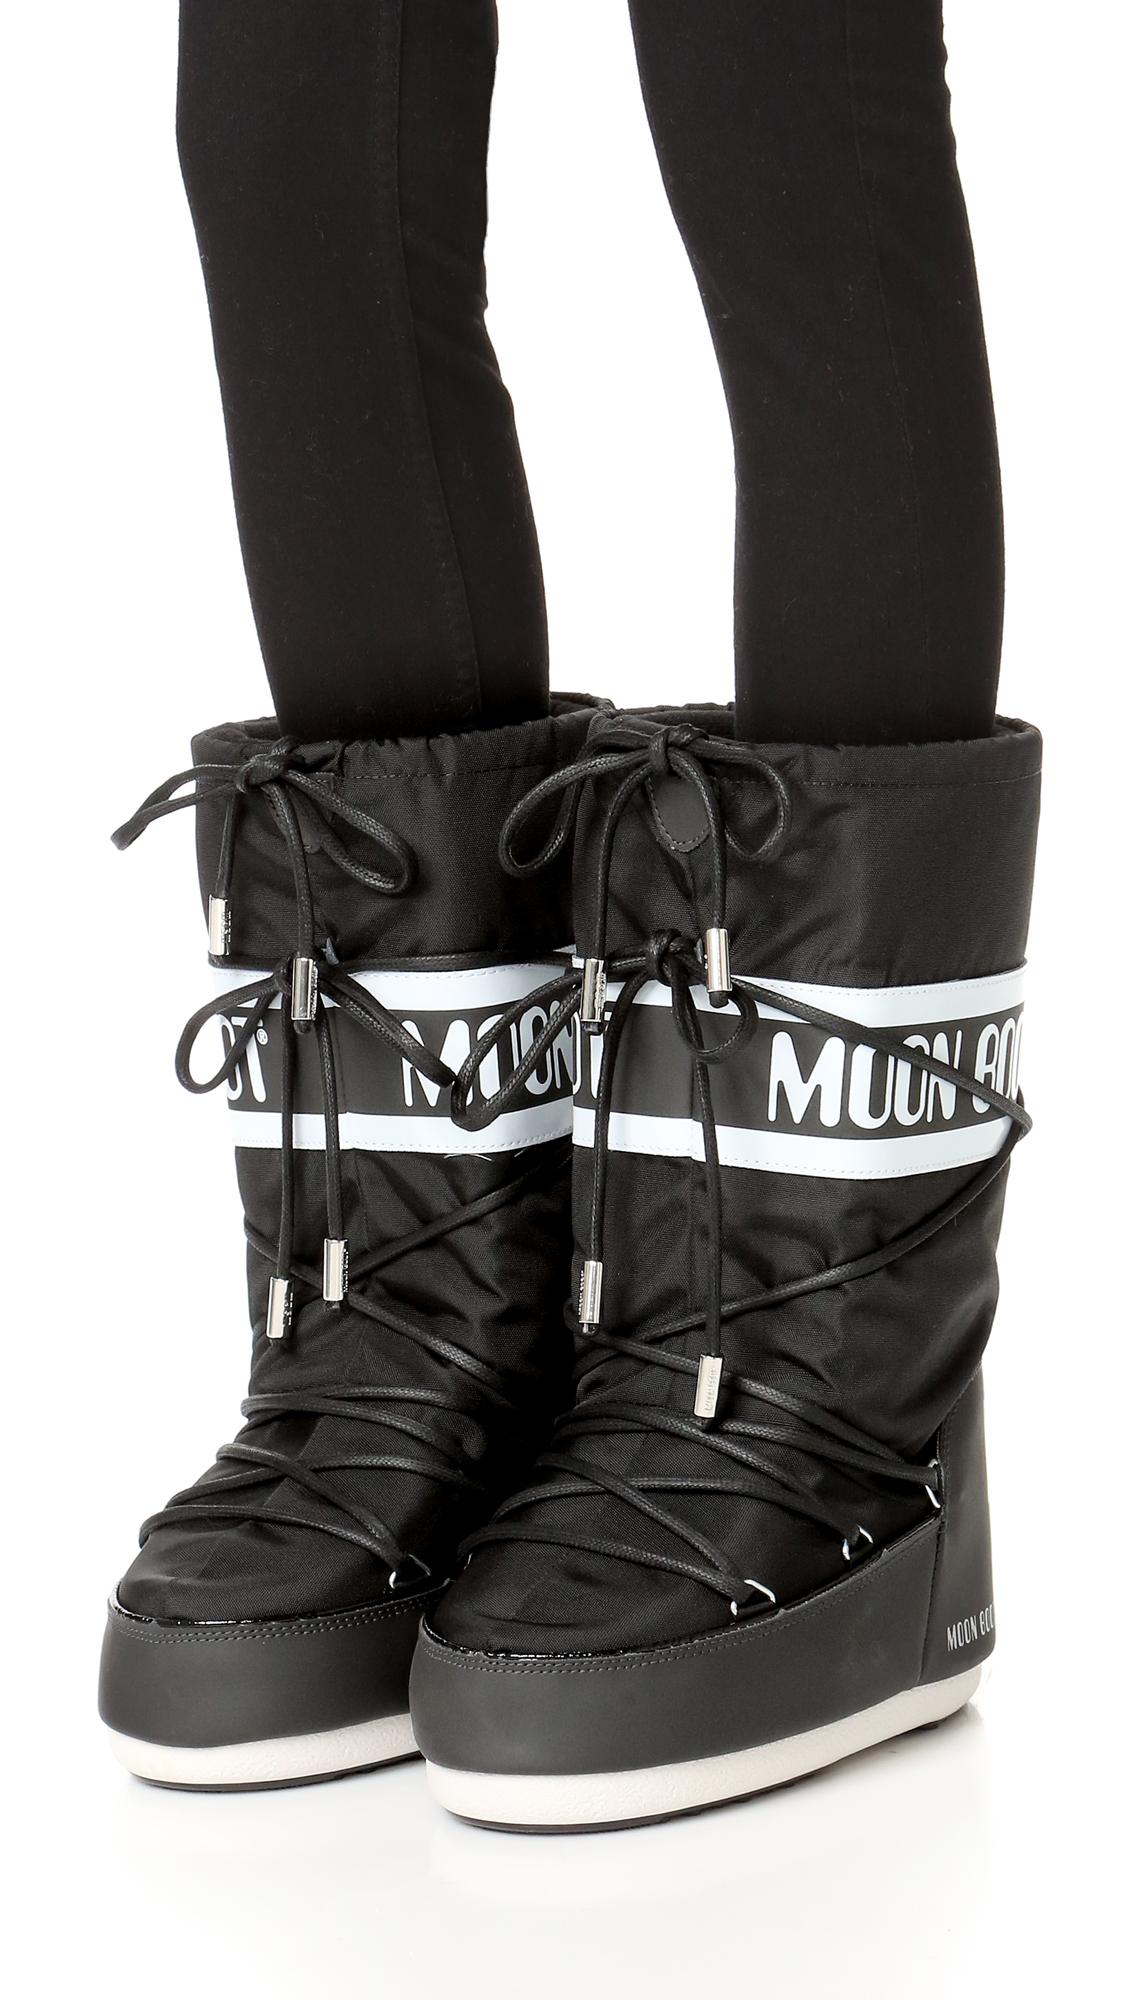 4a1f4299605c Moon Boots MSGM x Moon Boots Classic MI Boots